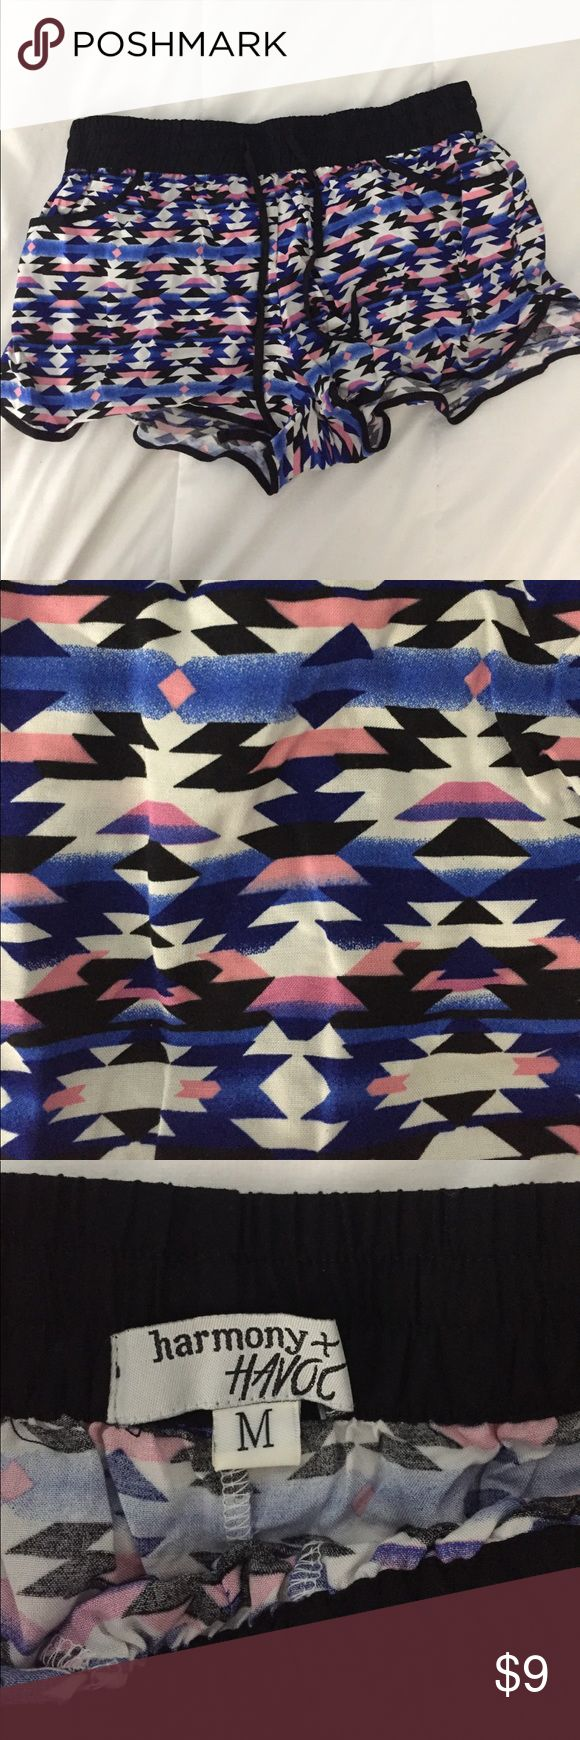 AZTEC PRINT FLOWY SHORTS Super cute flowy shorts, with pockets BRAND NEW Shorts